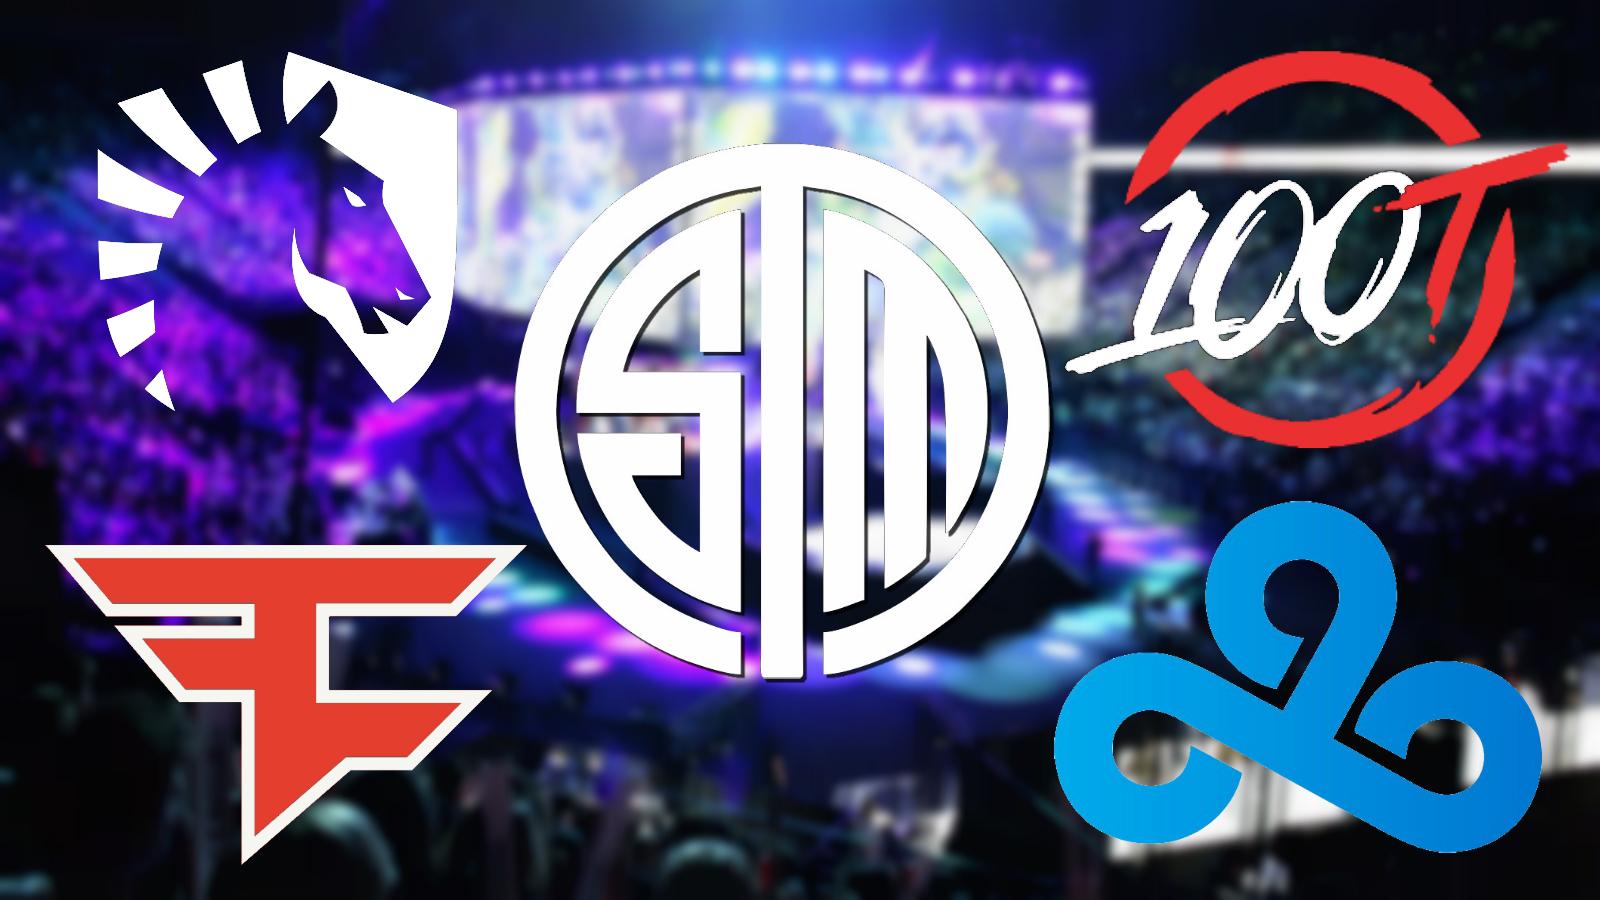 Esports team logos